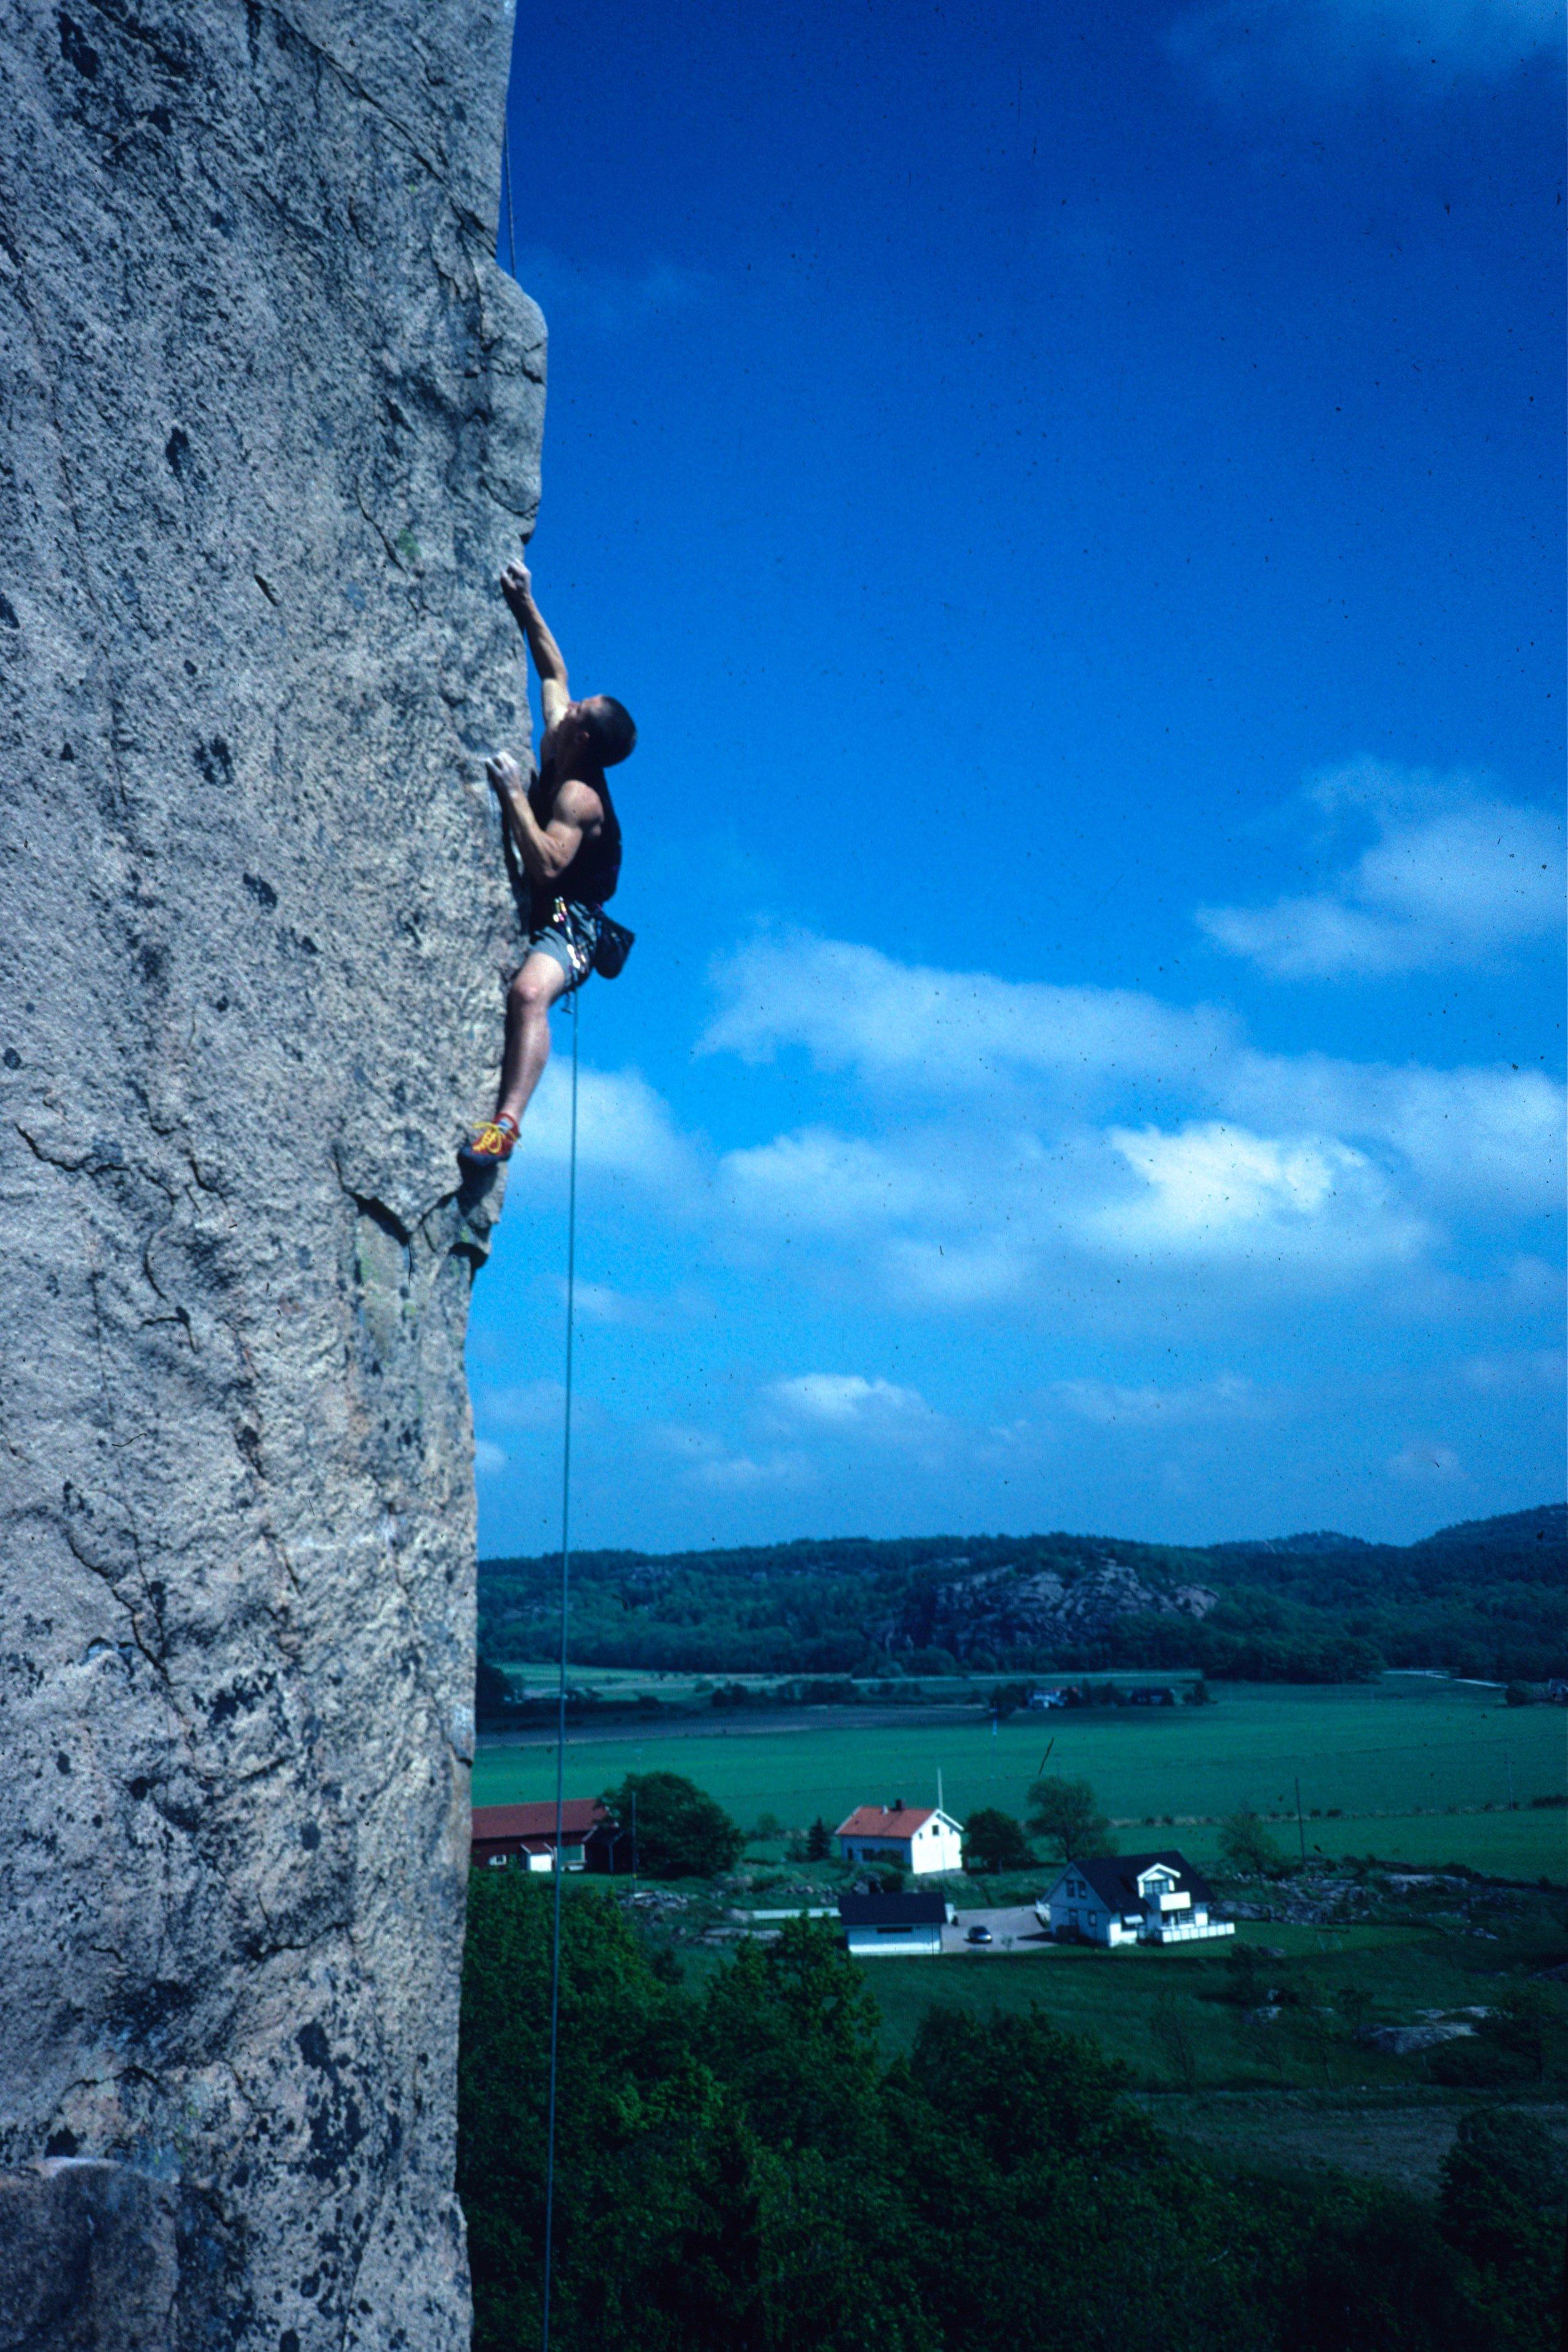 Minaret E8 6c, Halle, Sweden. Second ascent in 1999.  Photo: Gresham collection